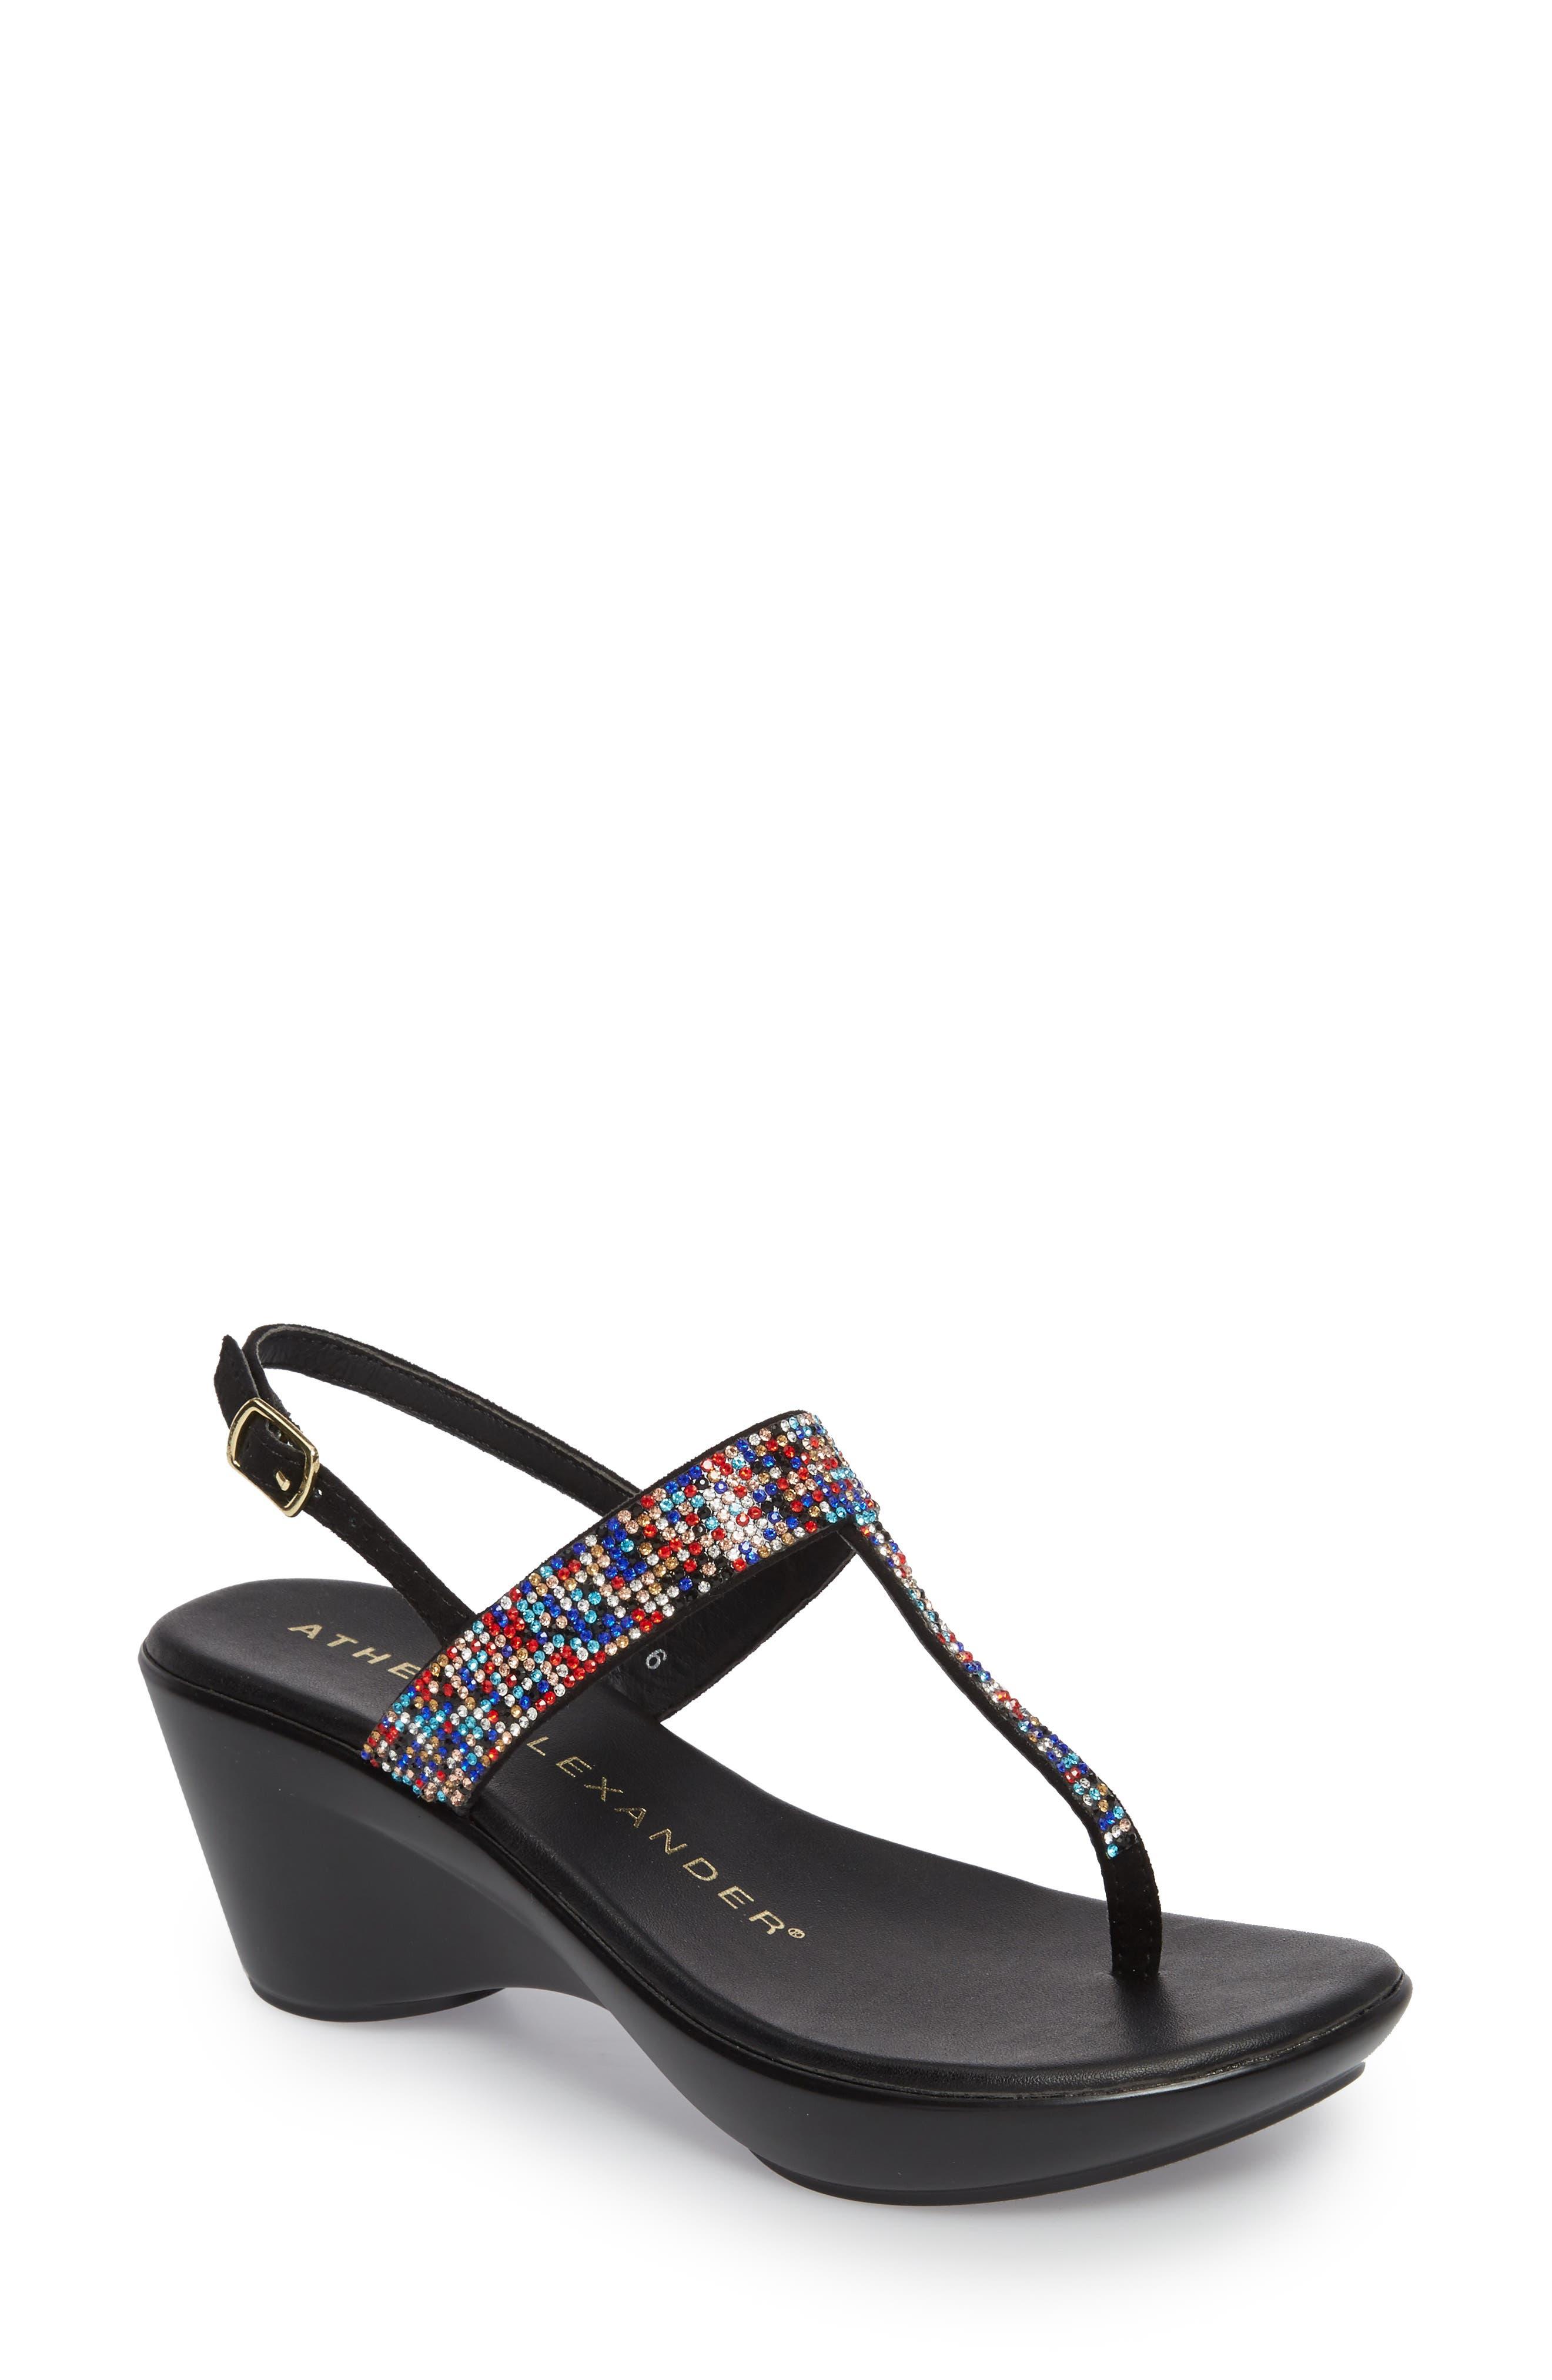 Dakkota Wedge Sandal,                             Main thumbnail 1, color,                             001